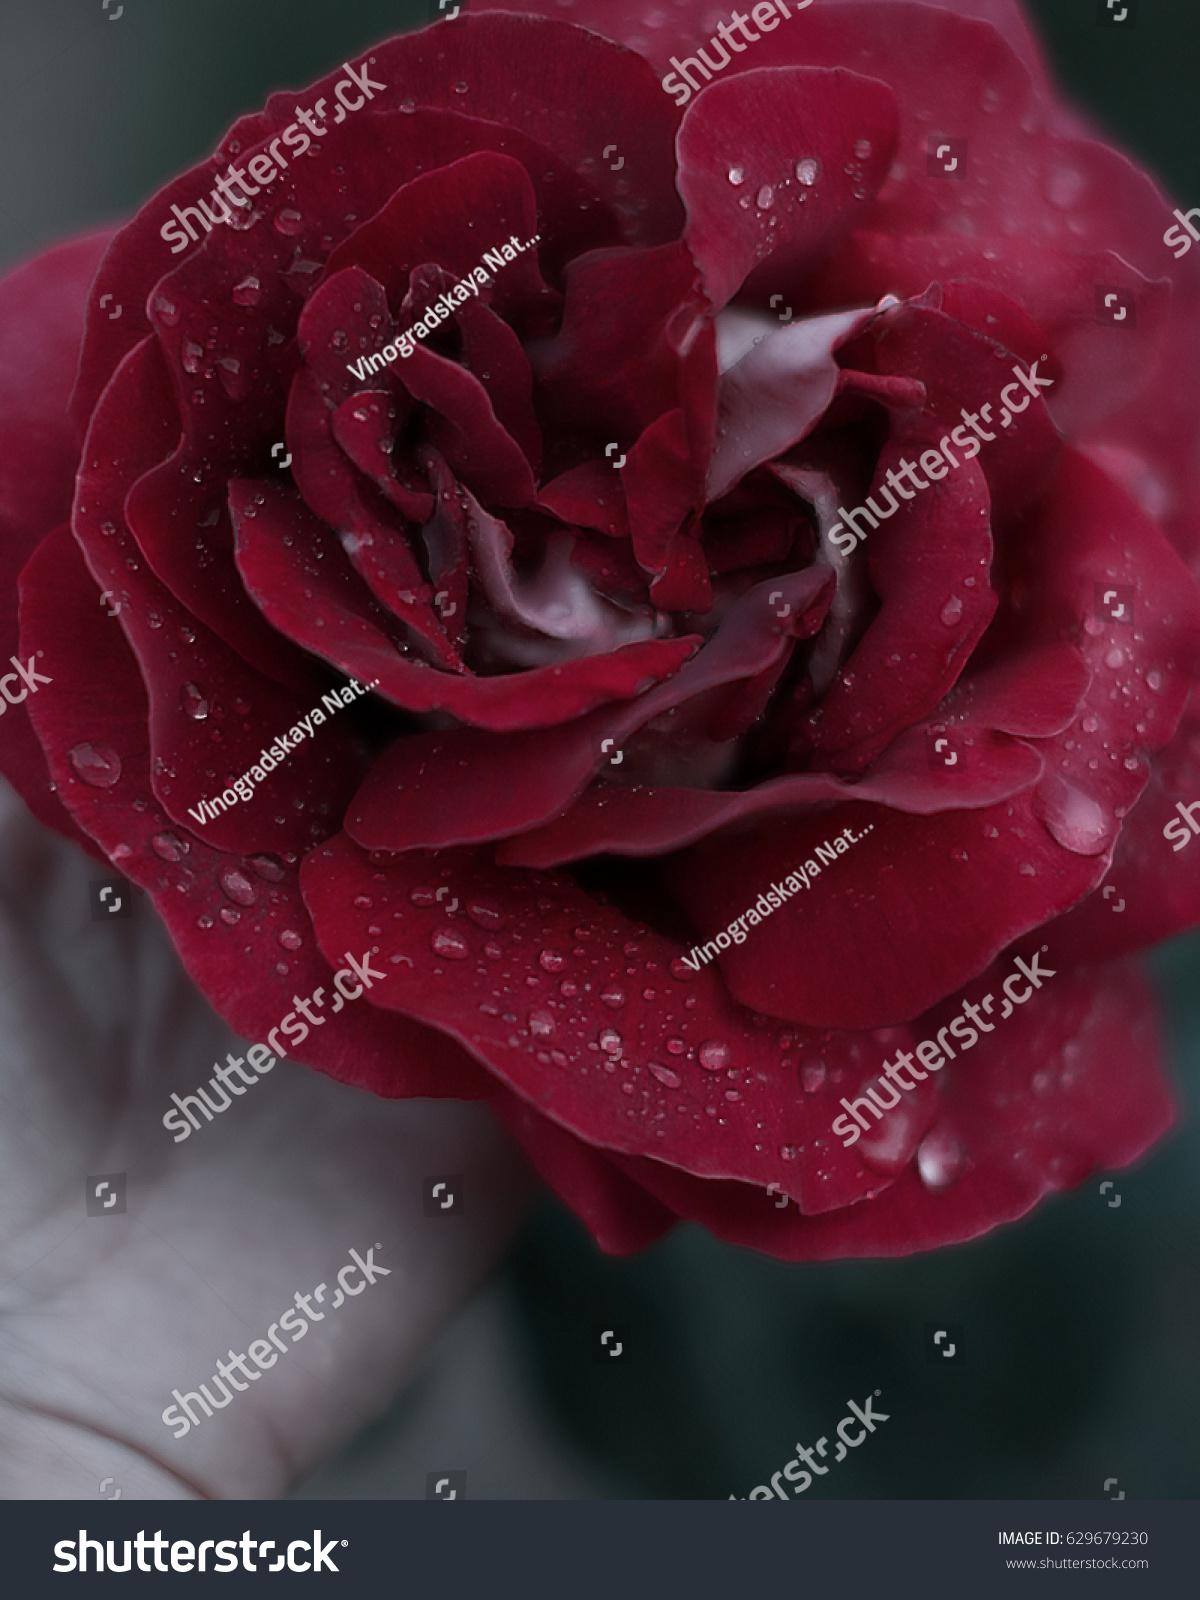 Beautiful flower red rose garden drops stock photo royalty free beautiful flower red rose in gardenw drops on izmirmasajfo